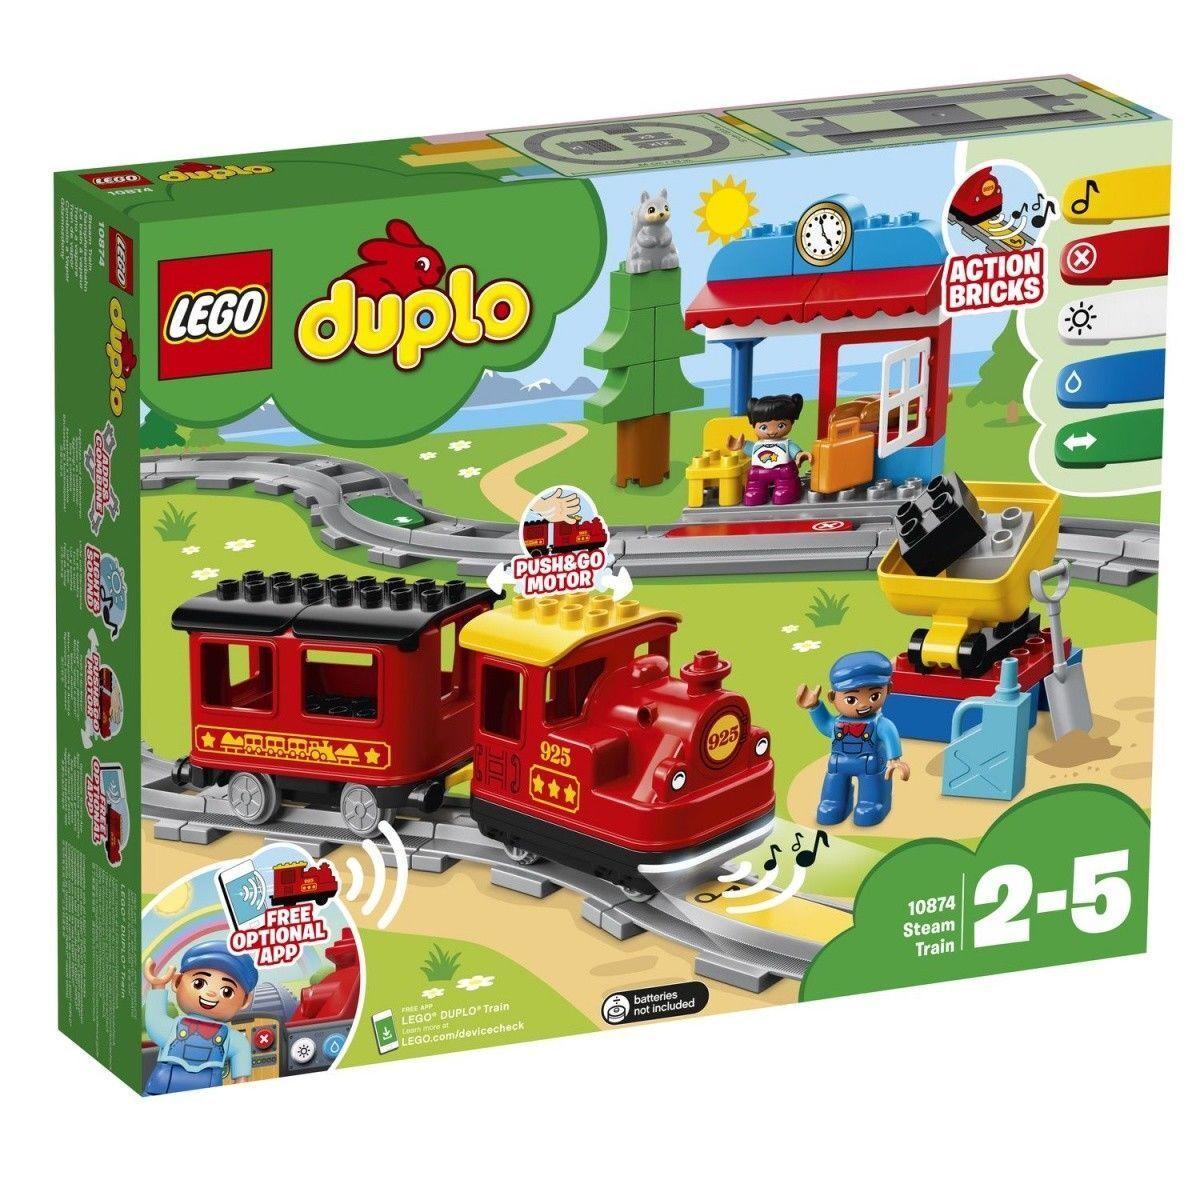 LEGO 10874 DUPLO-treni a vapore NUOVO OVP